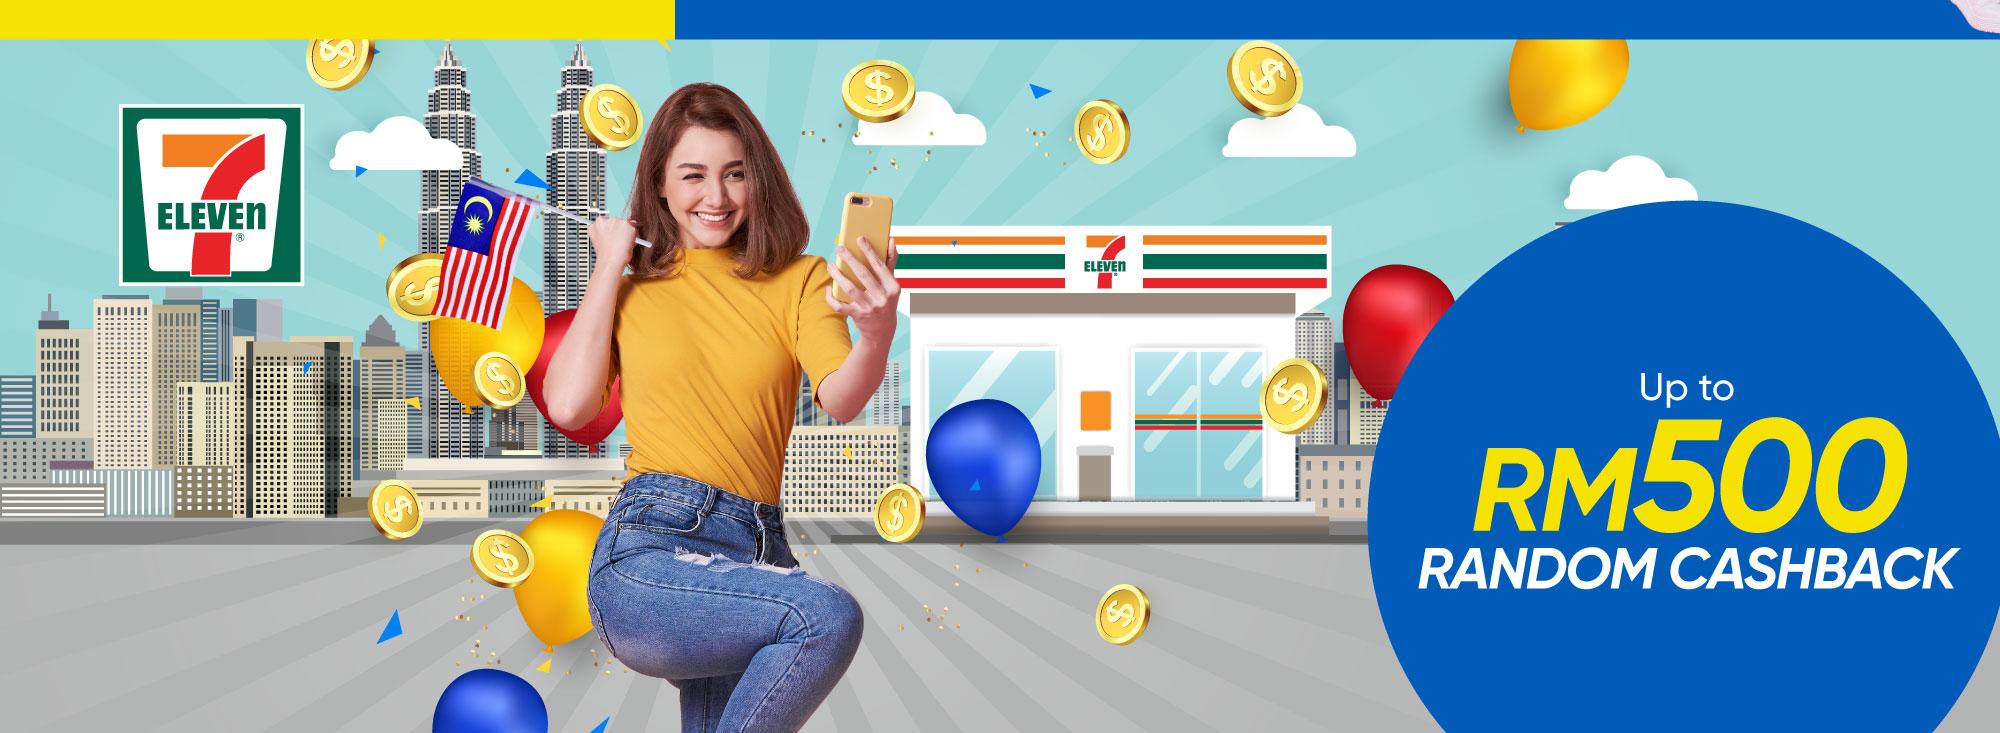 7-Eleven: Menang Sama-Sama Promotion